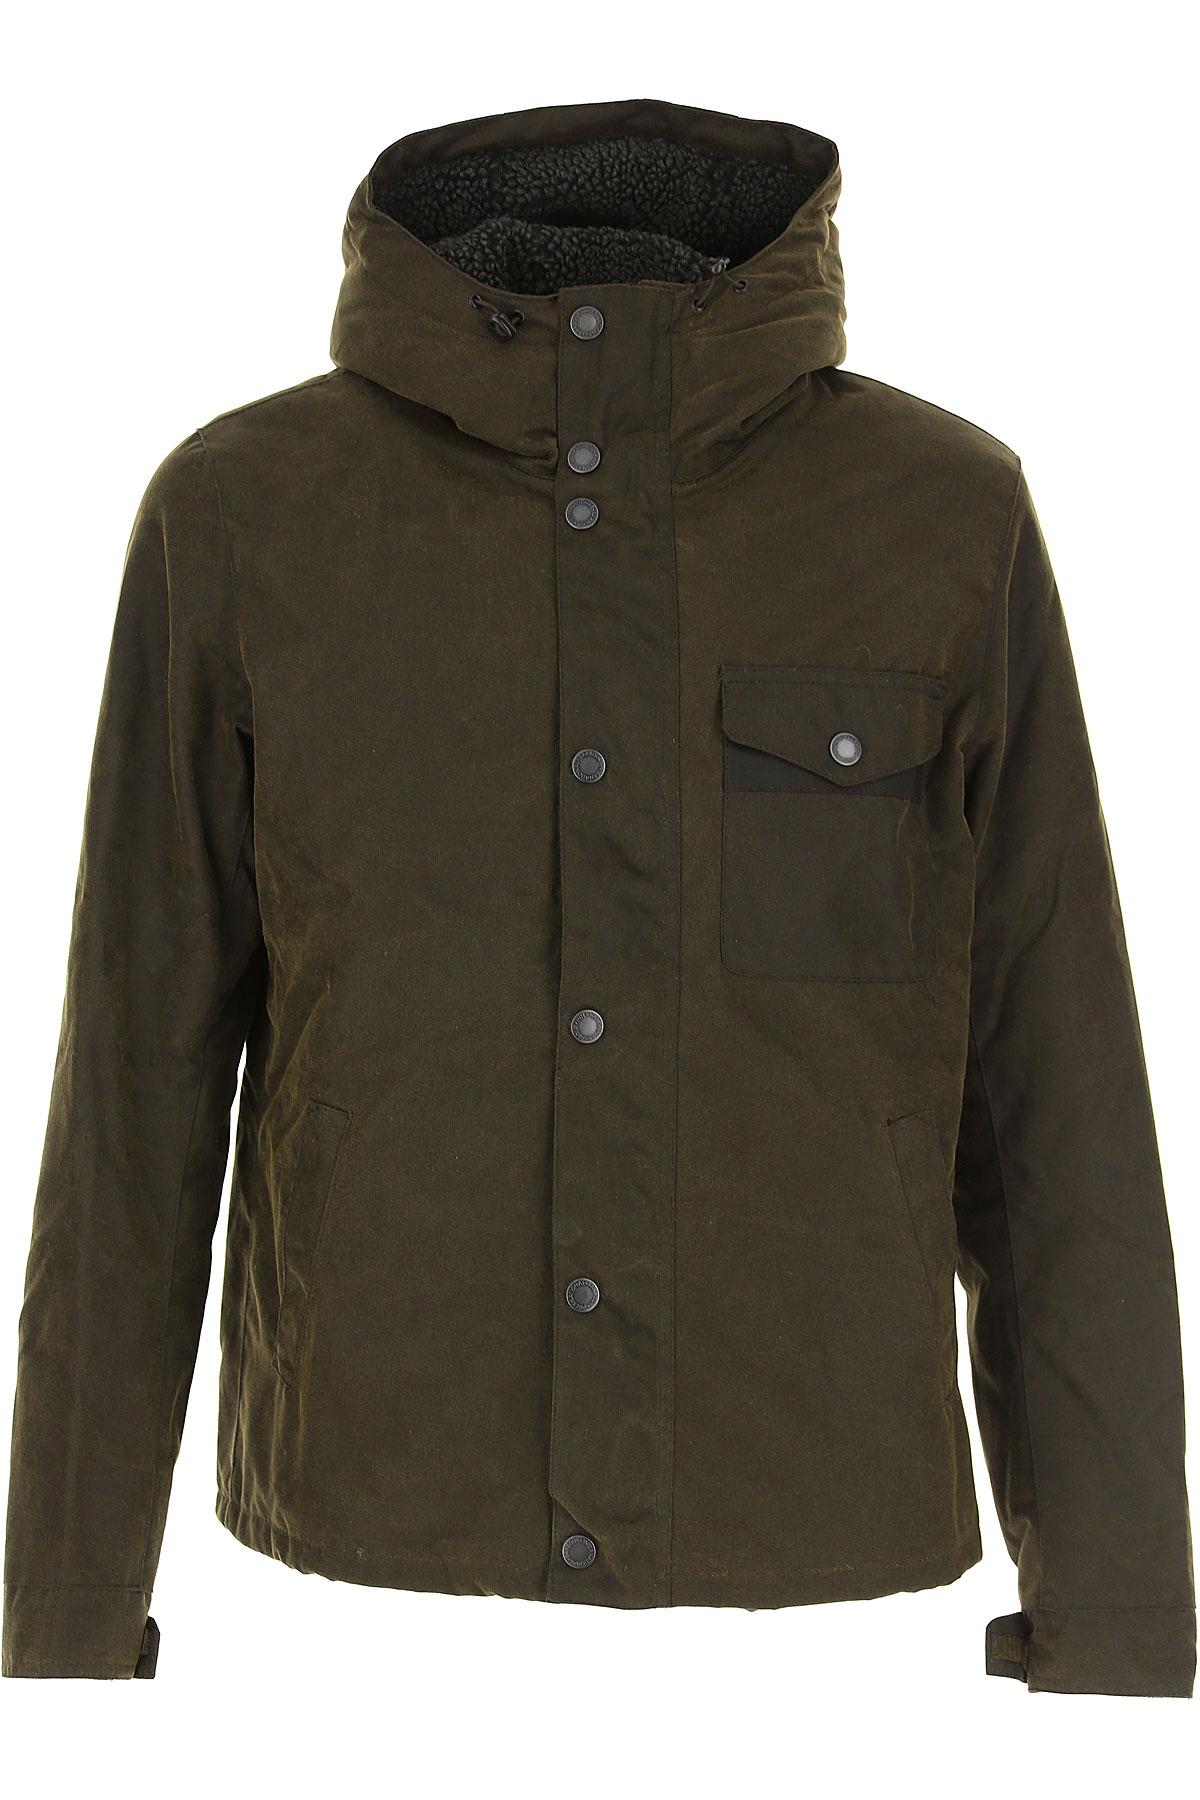 Barbour Jacket for Men On Sale, Olive Green, Cotton, 2019, M XL